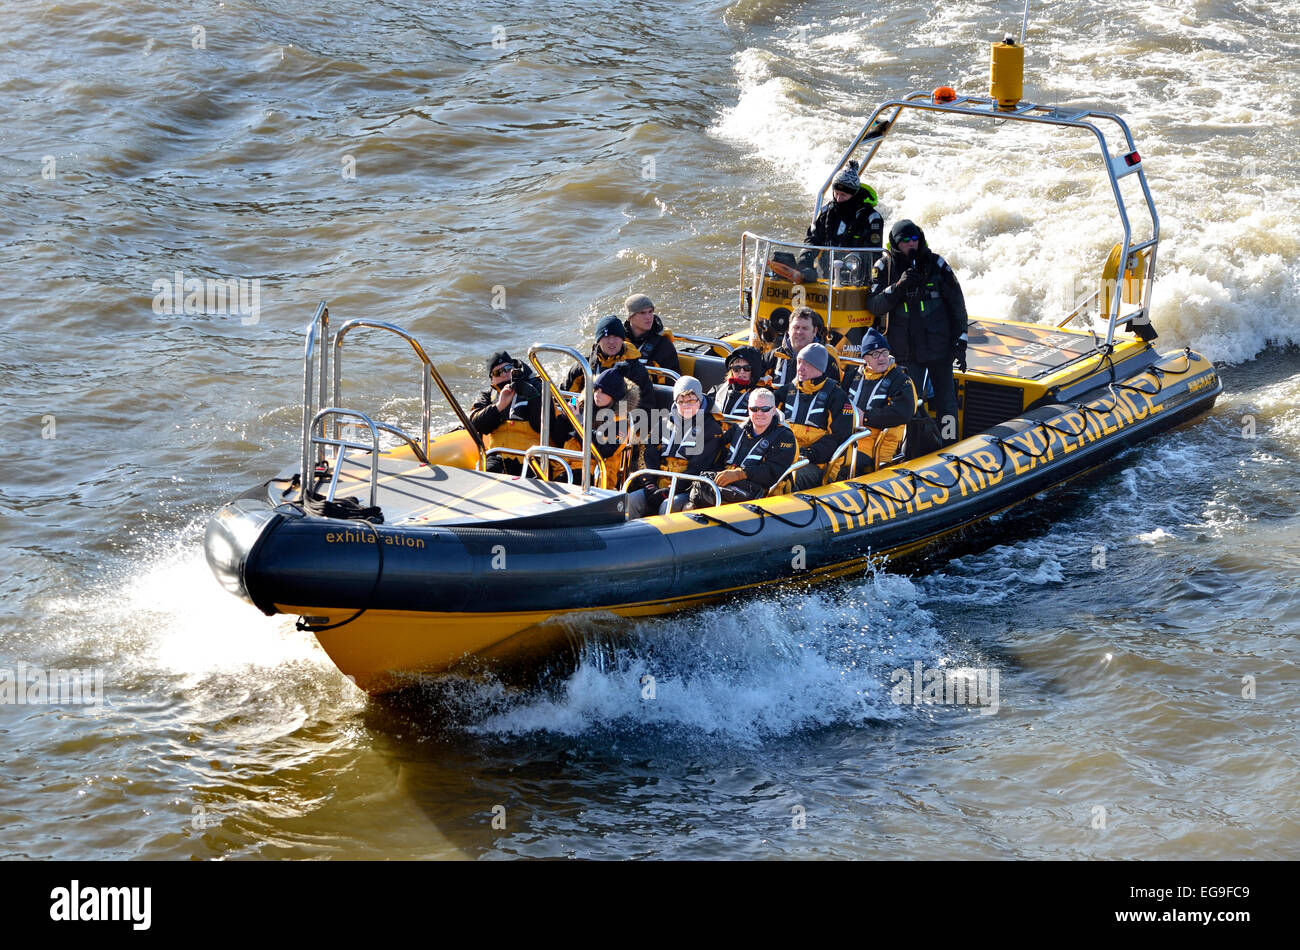 london-england-uk-tourists-on-an-inflata